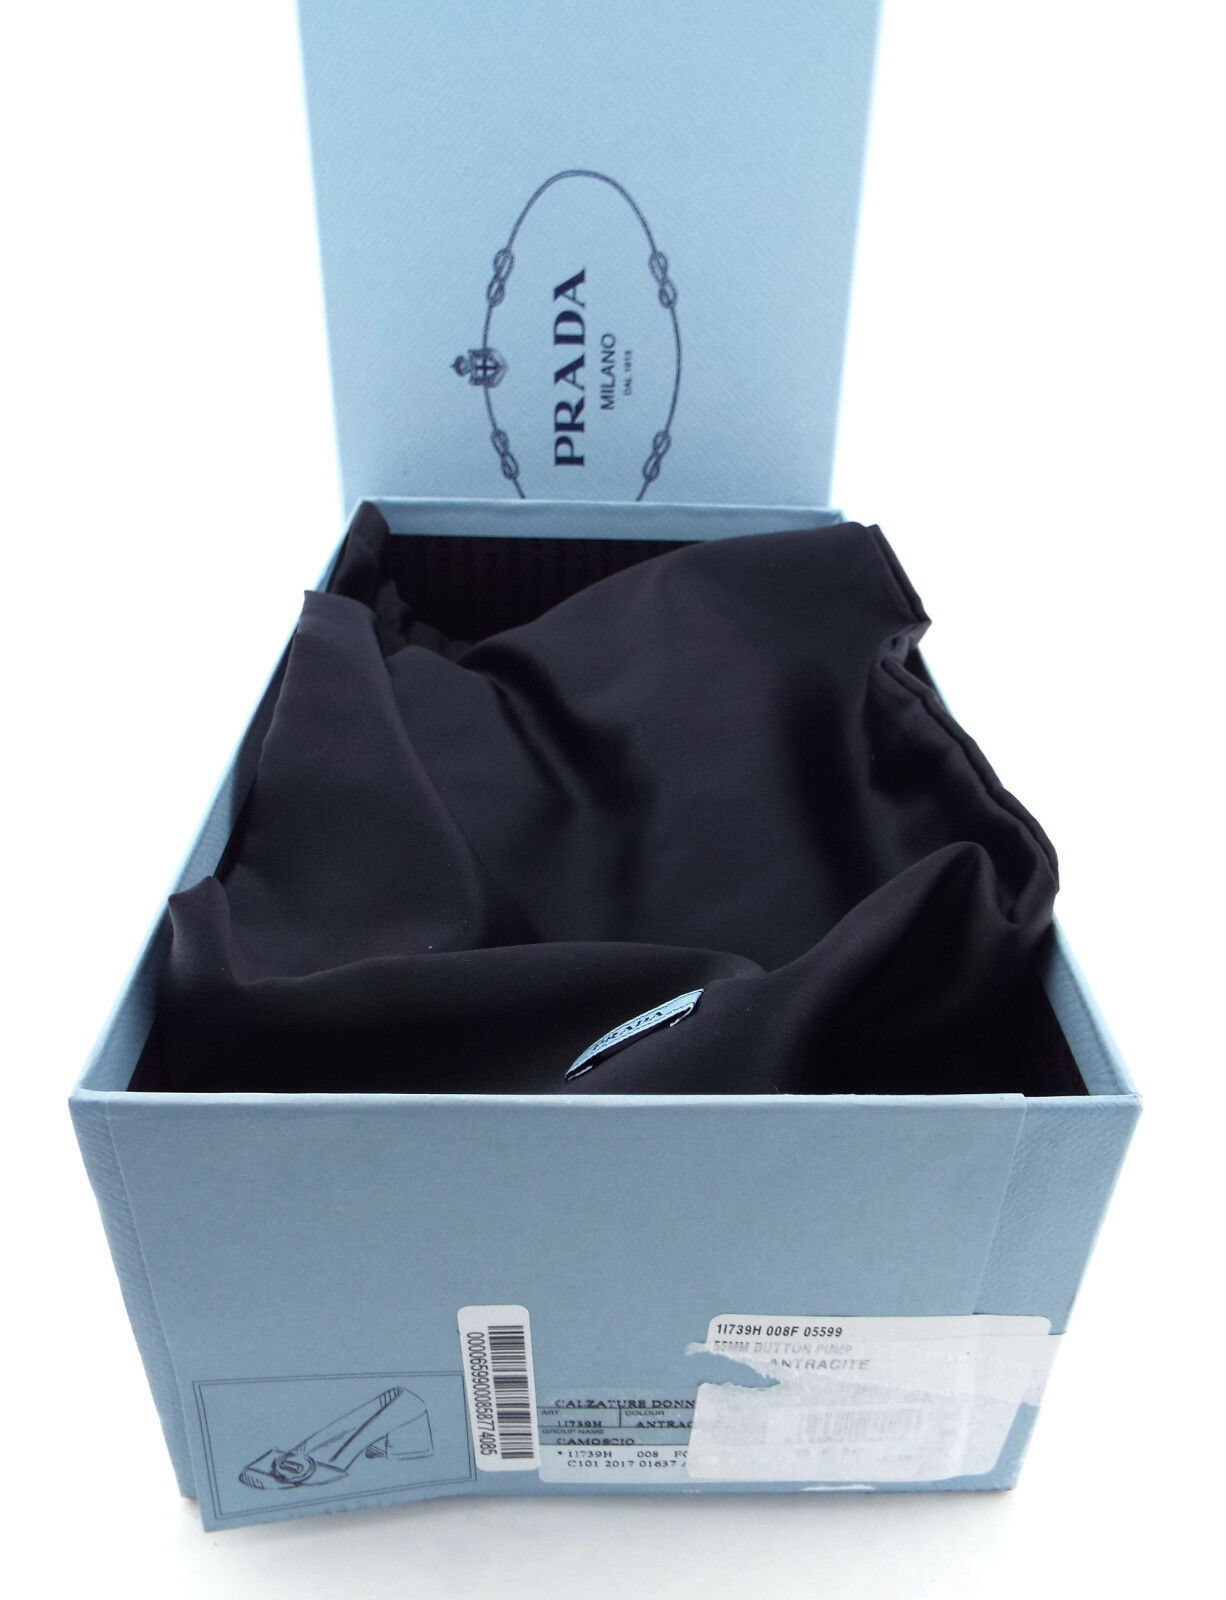 New PRADA Size 6.5 Gray Suede Logo Button Block Heel Pumps Shoes 36.5